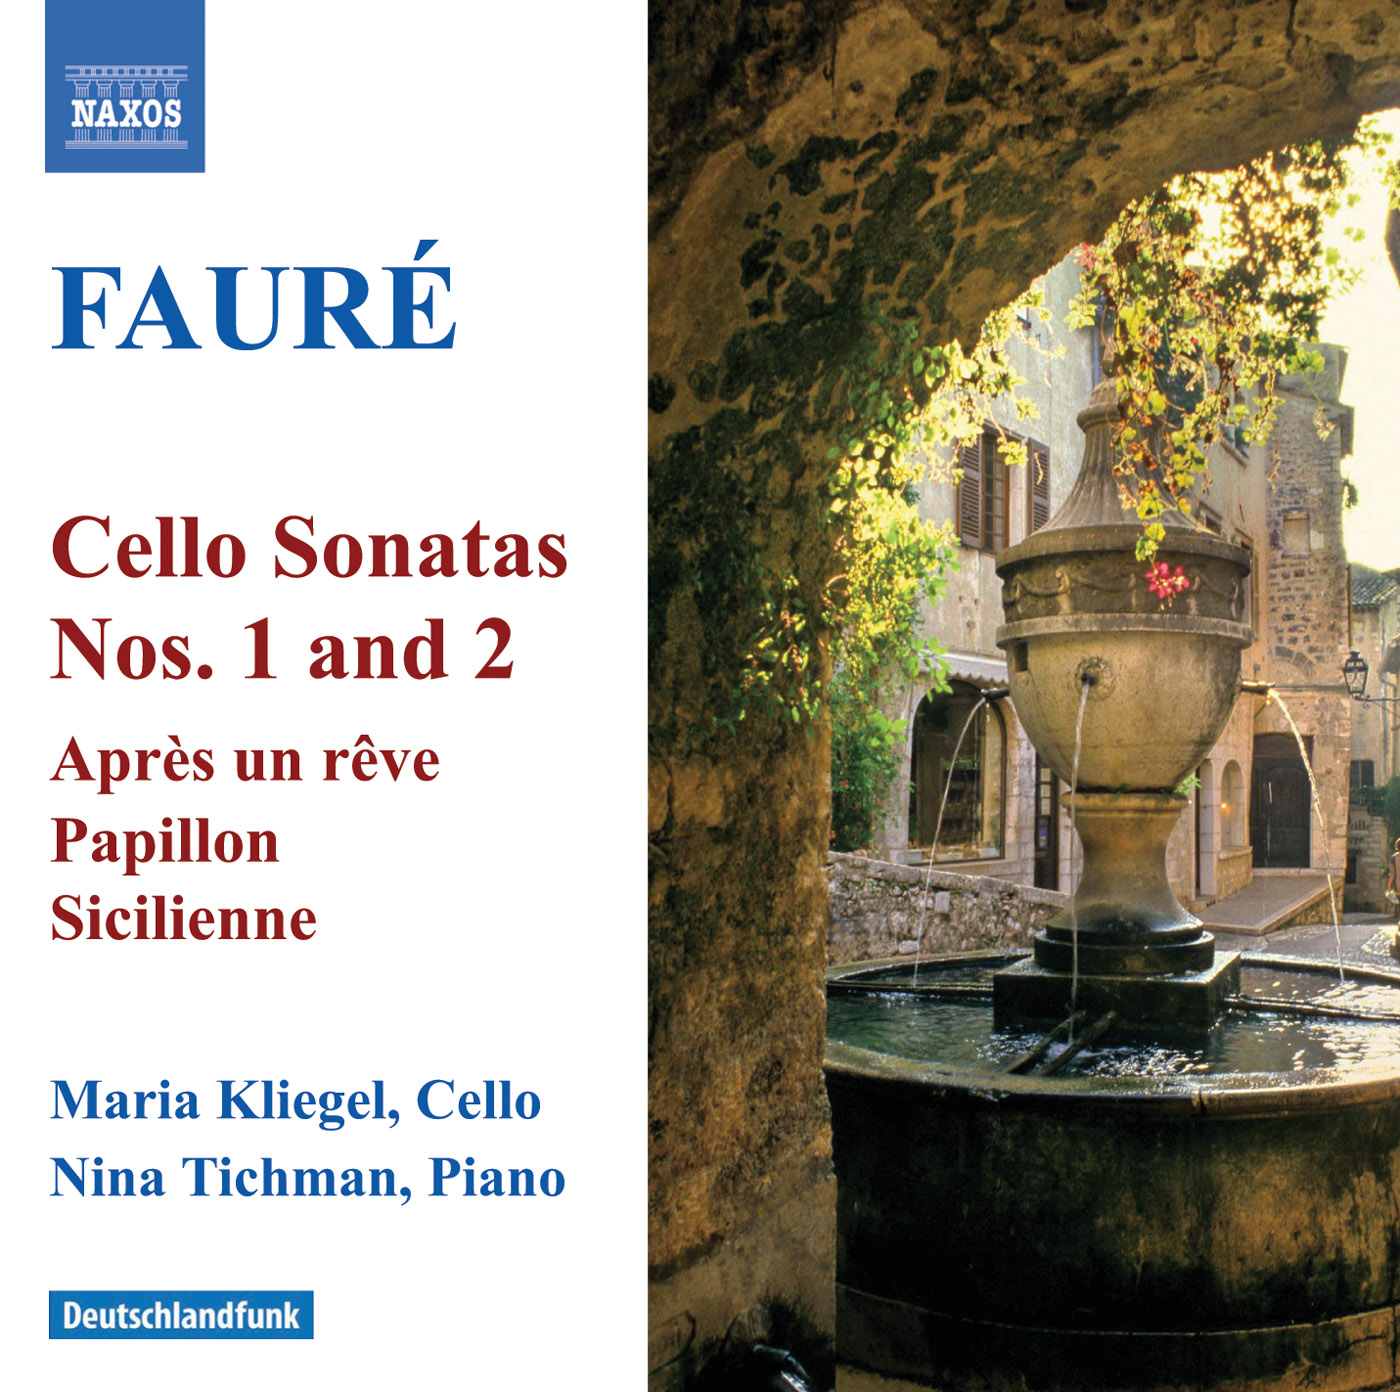 Faure: Cello Sonatas Nos. 1 and 2 - Elegie - Romance